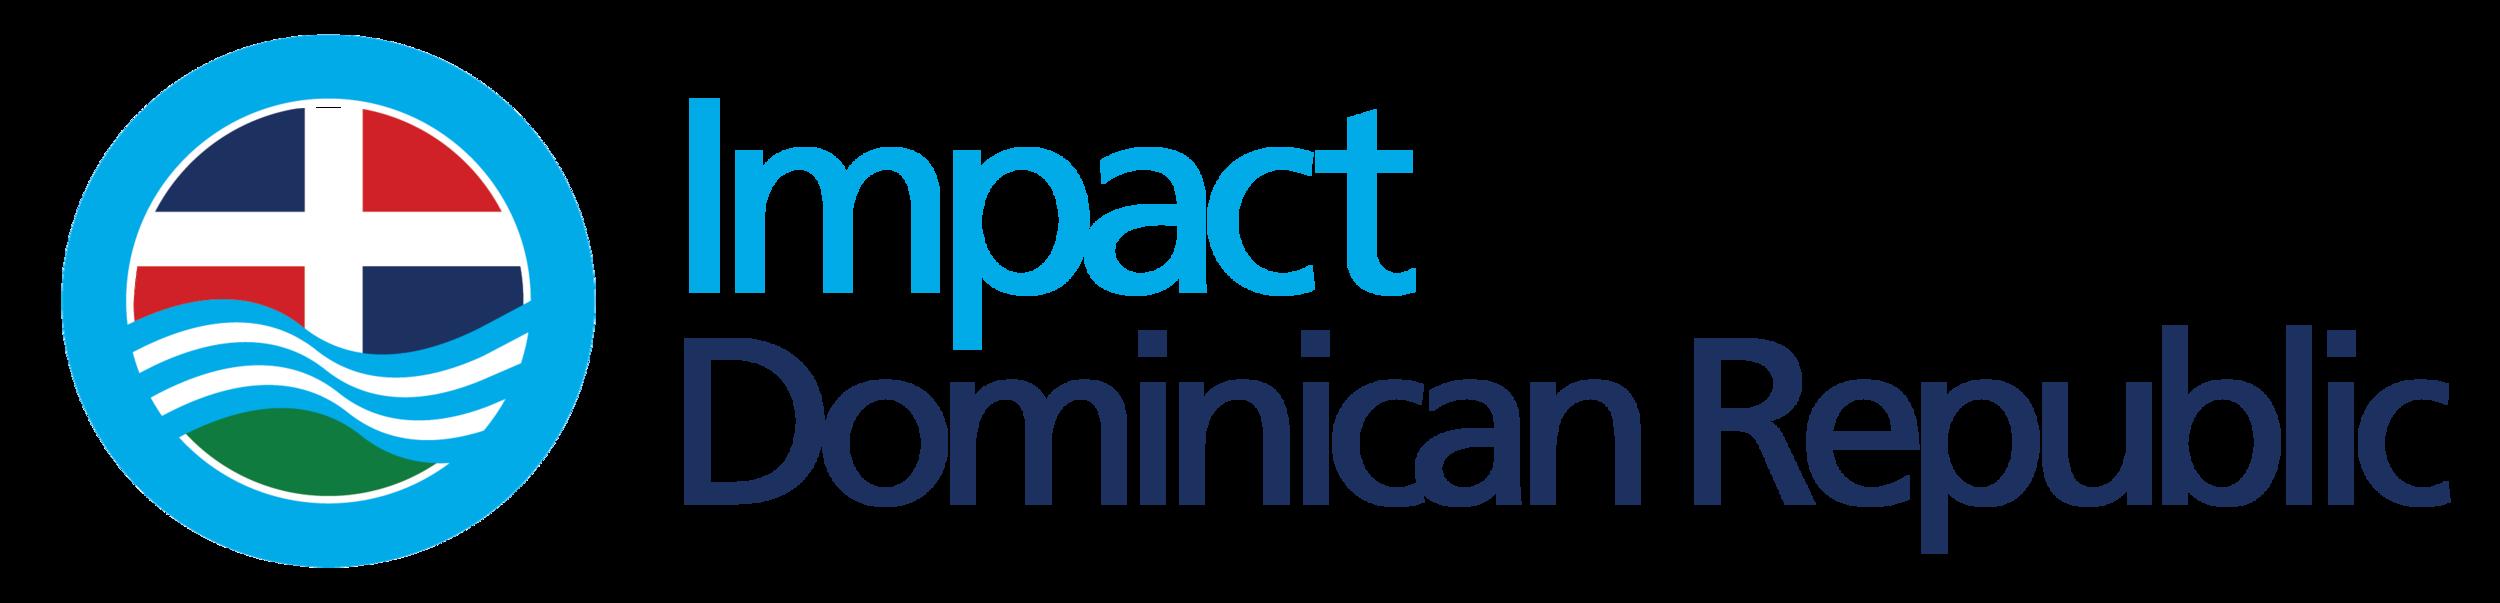 Impact Dominican Republic Impact Logo-01.png